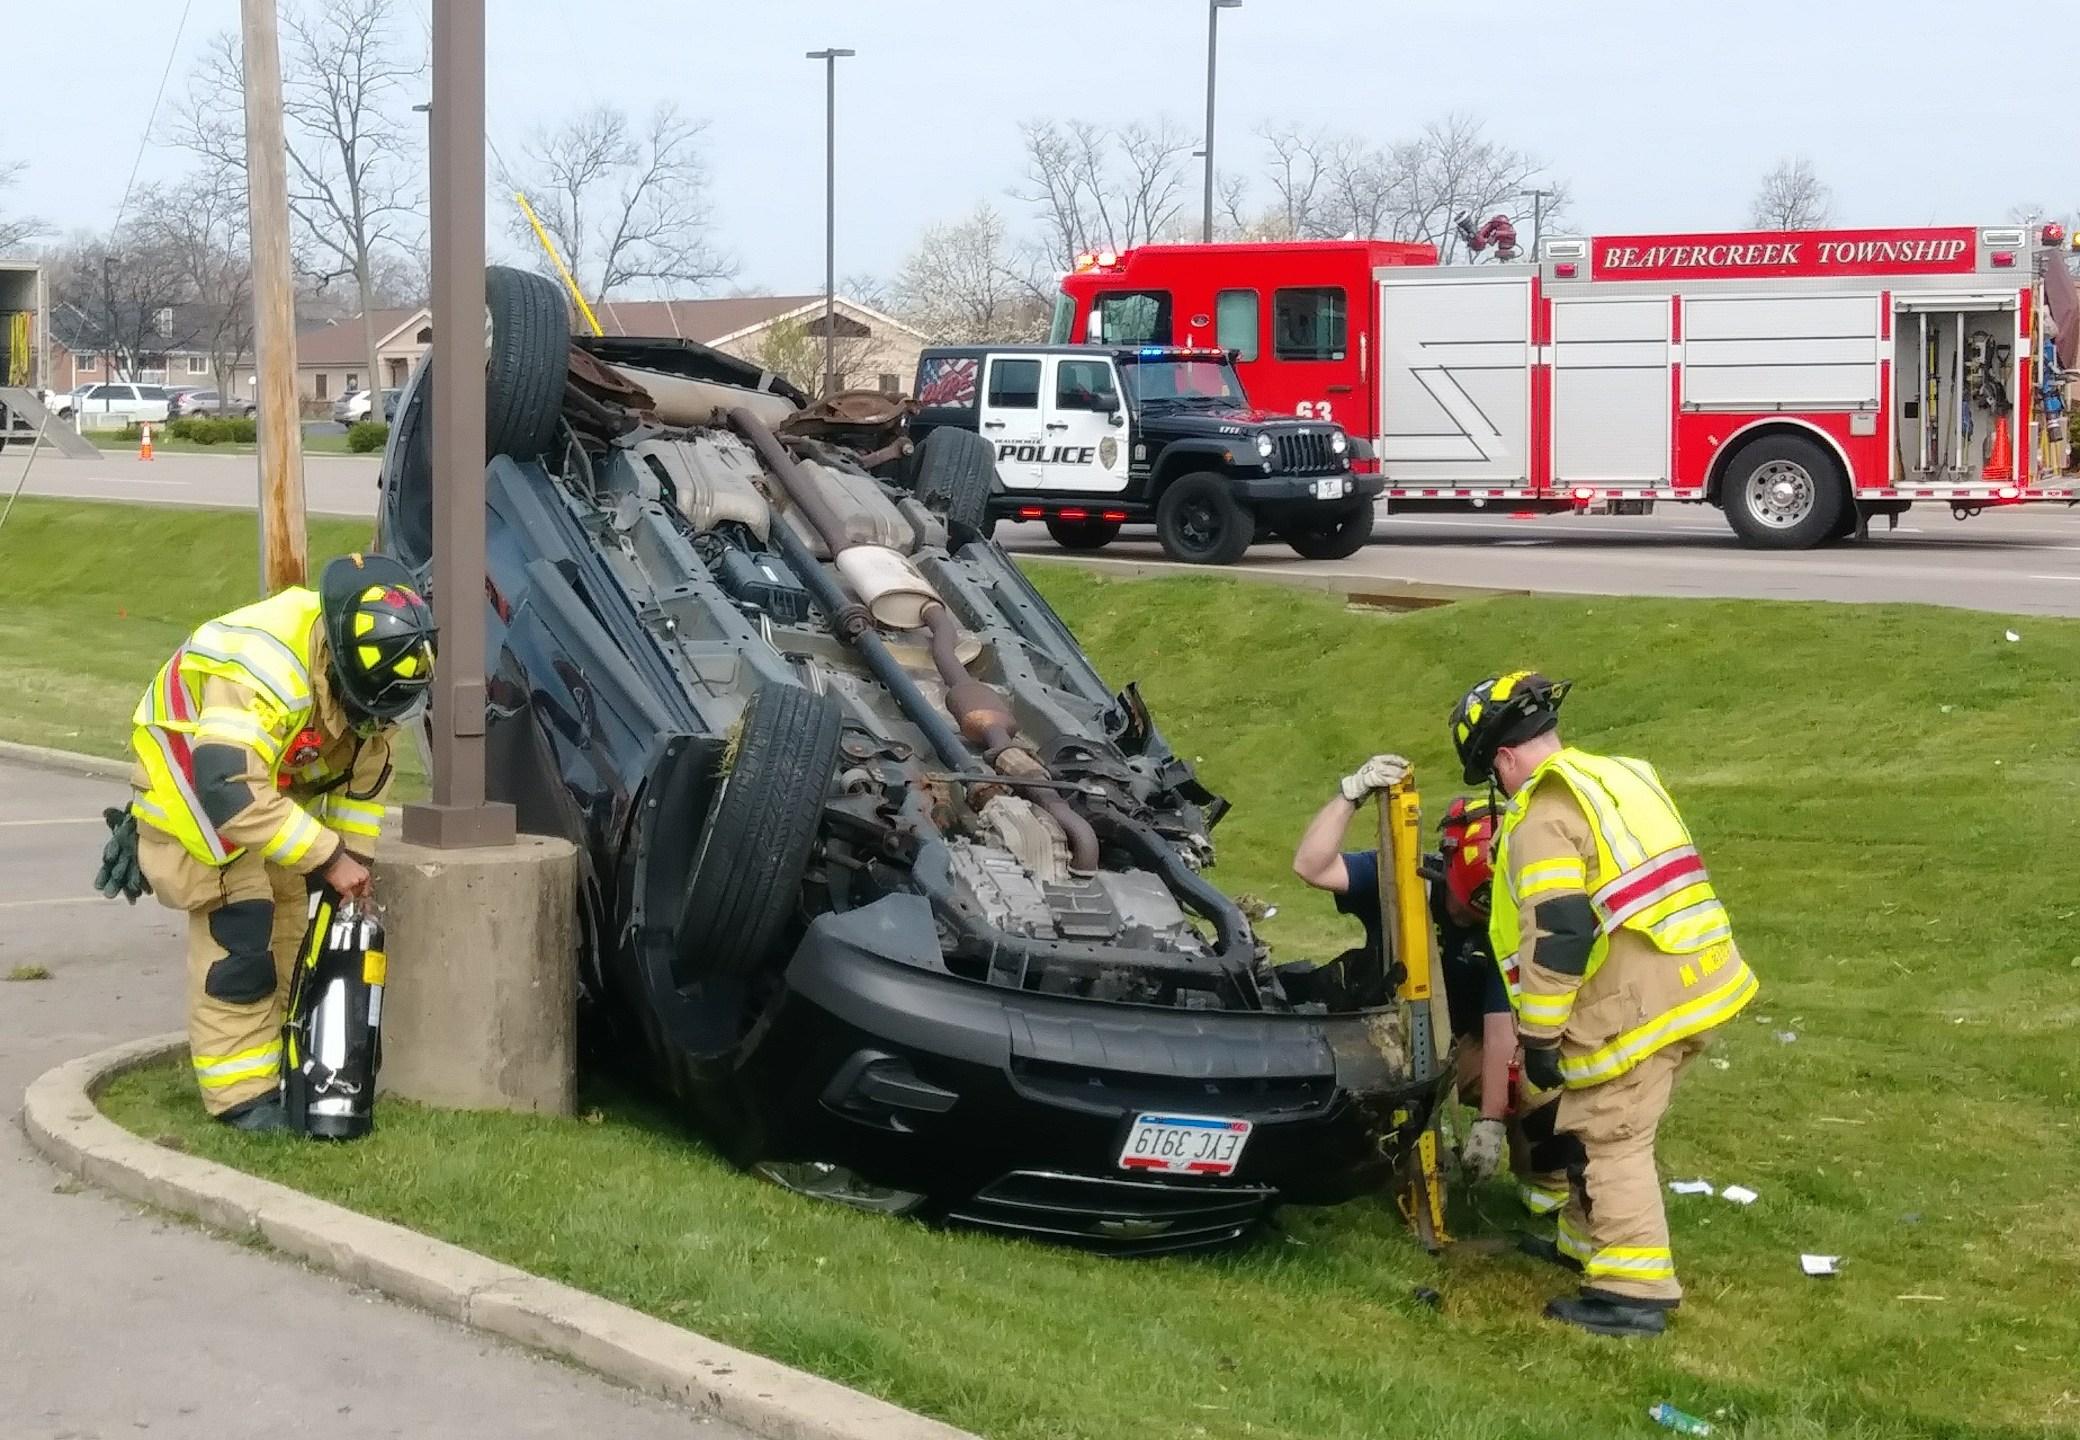 Car flips over in three-vehicle crash in Beavercreek